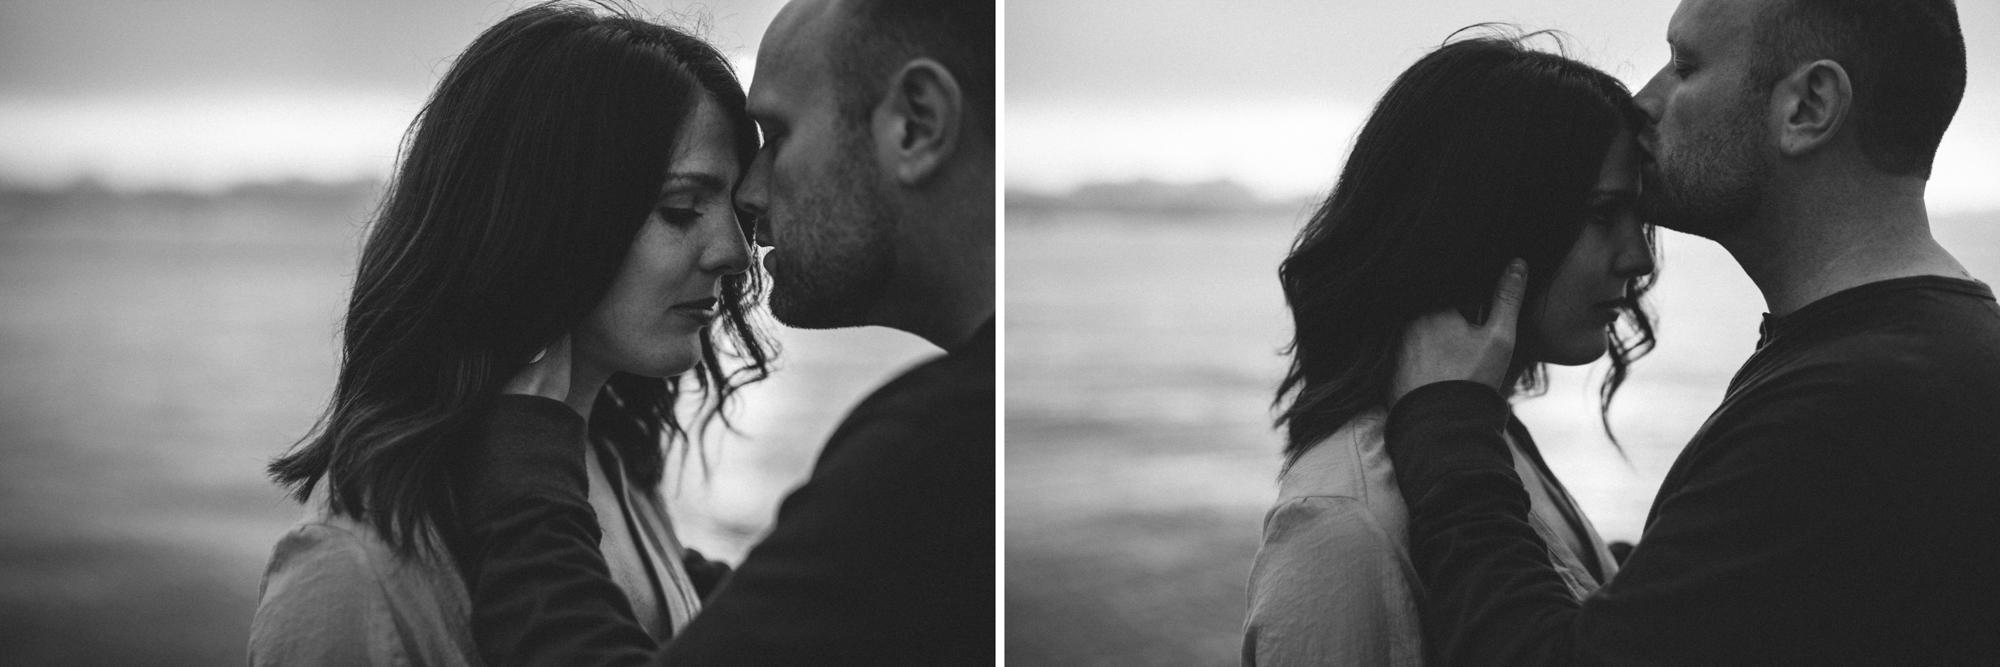 LFA_JaclynAndrew_Portland_Maine_Engagement_shoot-0006.jpg